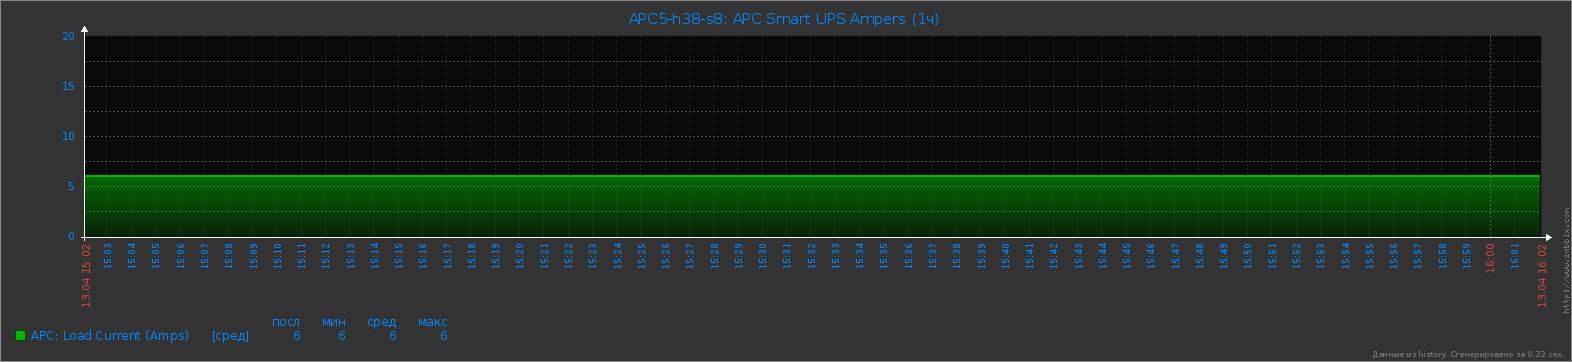 APC Smart UPS - Ampers